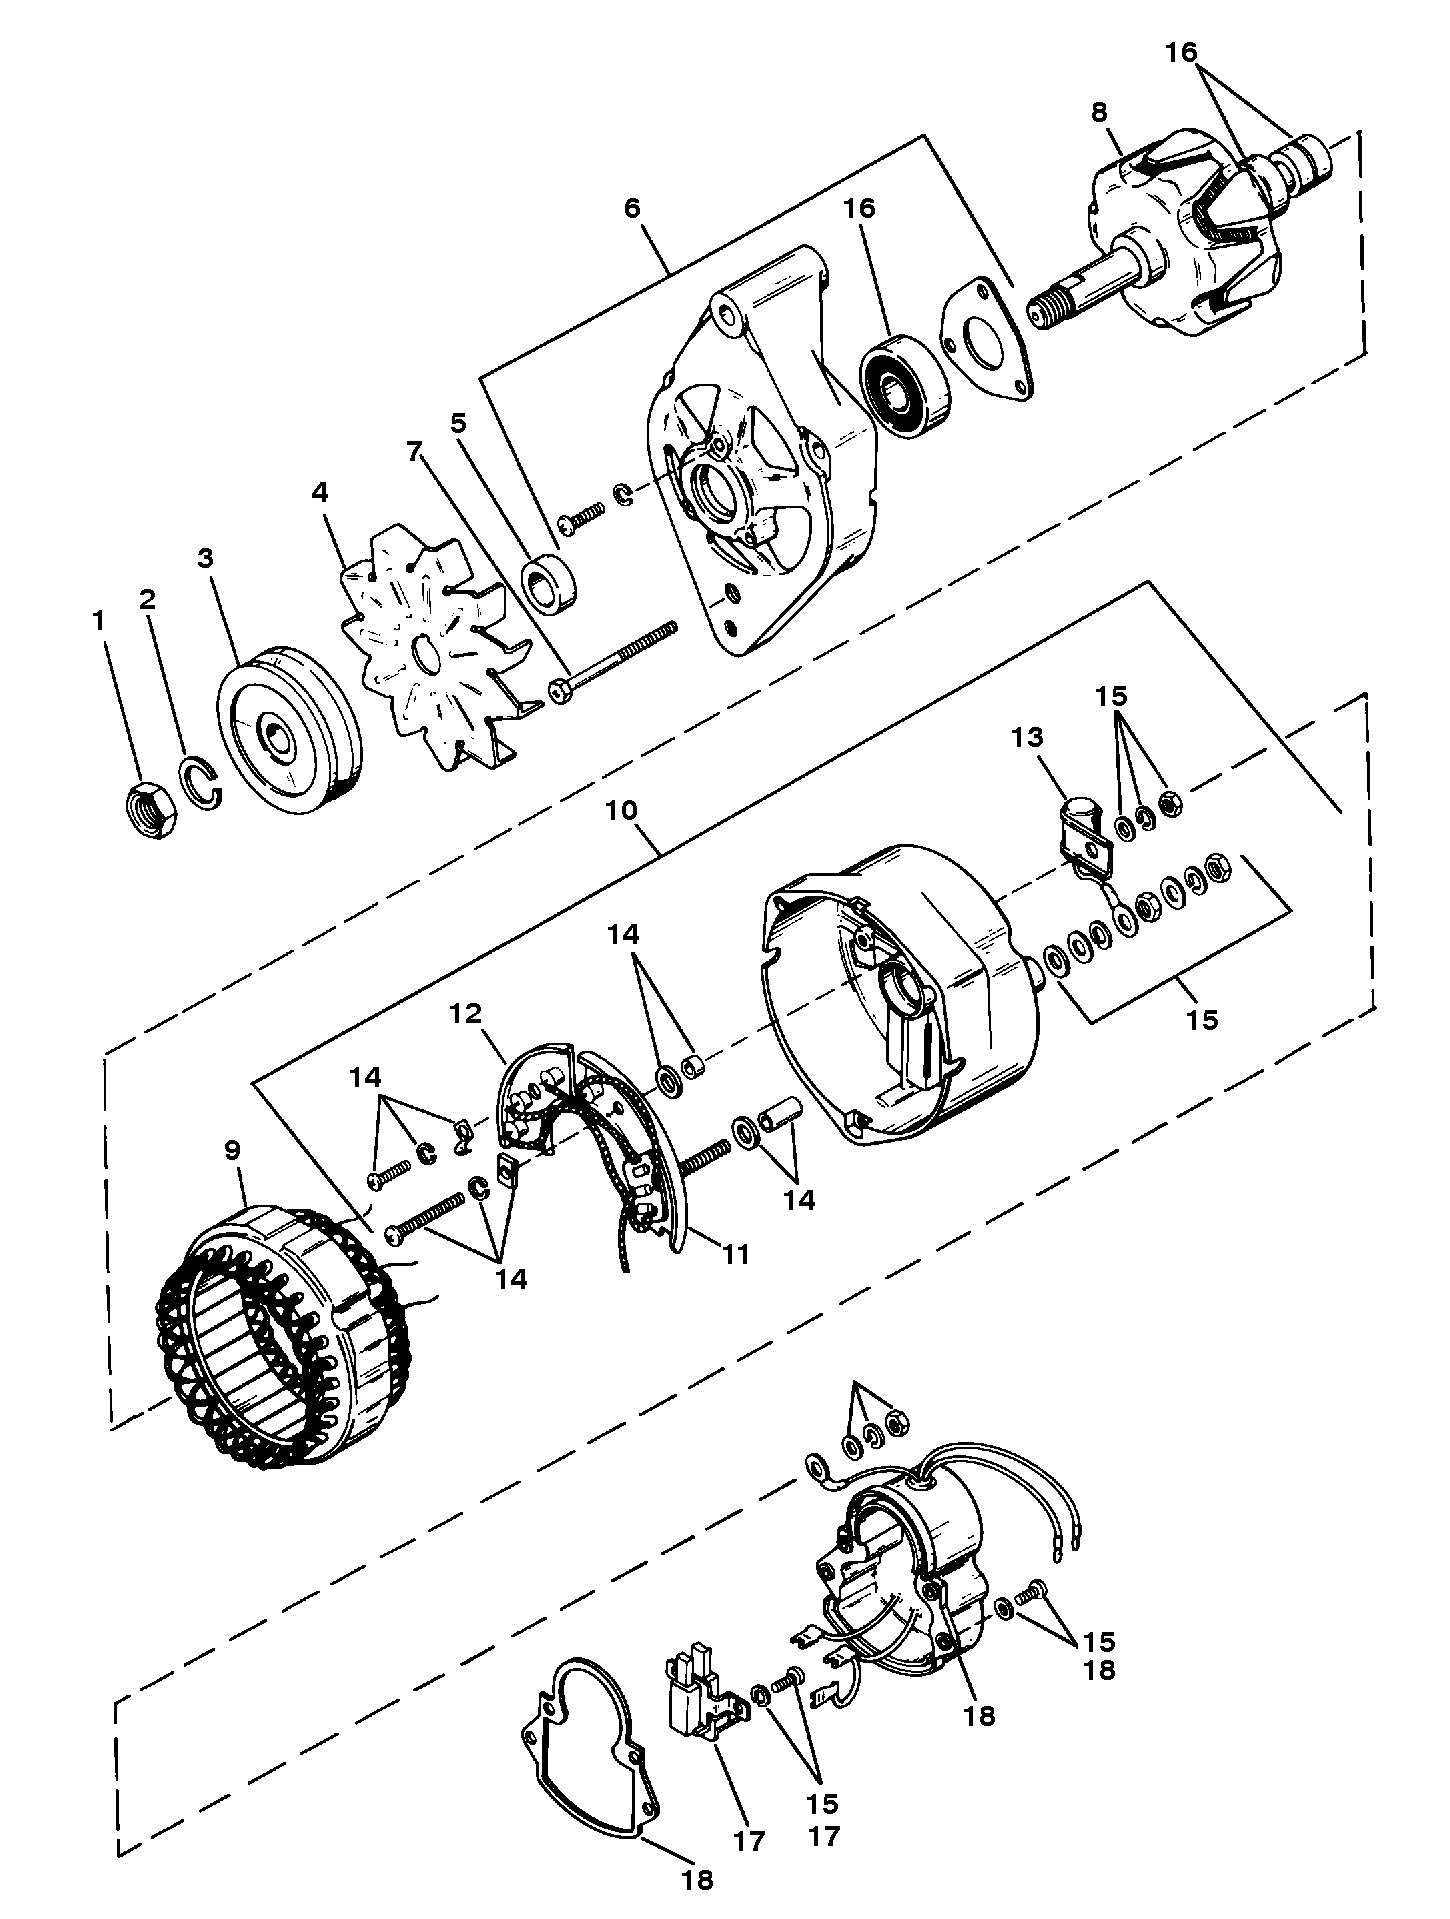 Prestolite Alternator Design | Wiring Diagram Database on mando alternator wiring, nippon denso alternator wiring, sev marchal alternator wiring, valeo alternator wiring, delco remy alternator wiring, mini alternator wiring, leece neville alternator wiring,